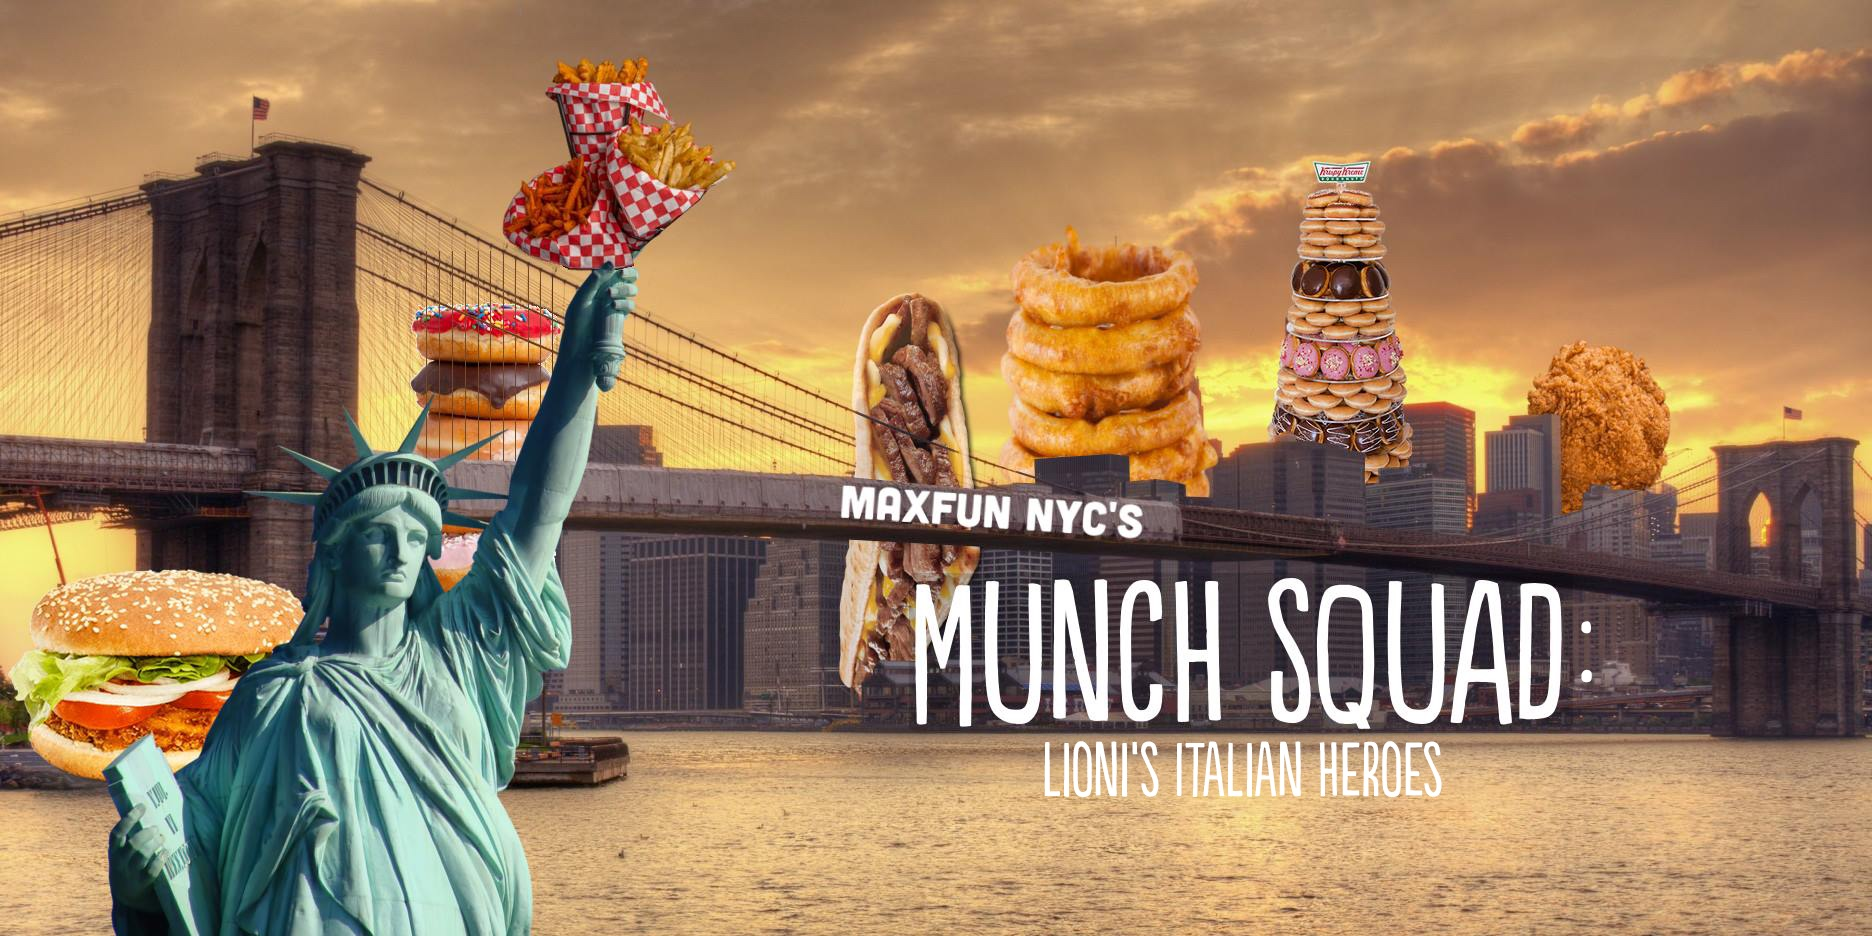 maxfun nyc munch squad lionis